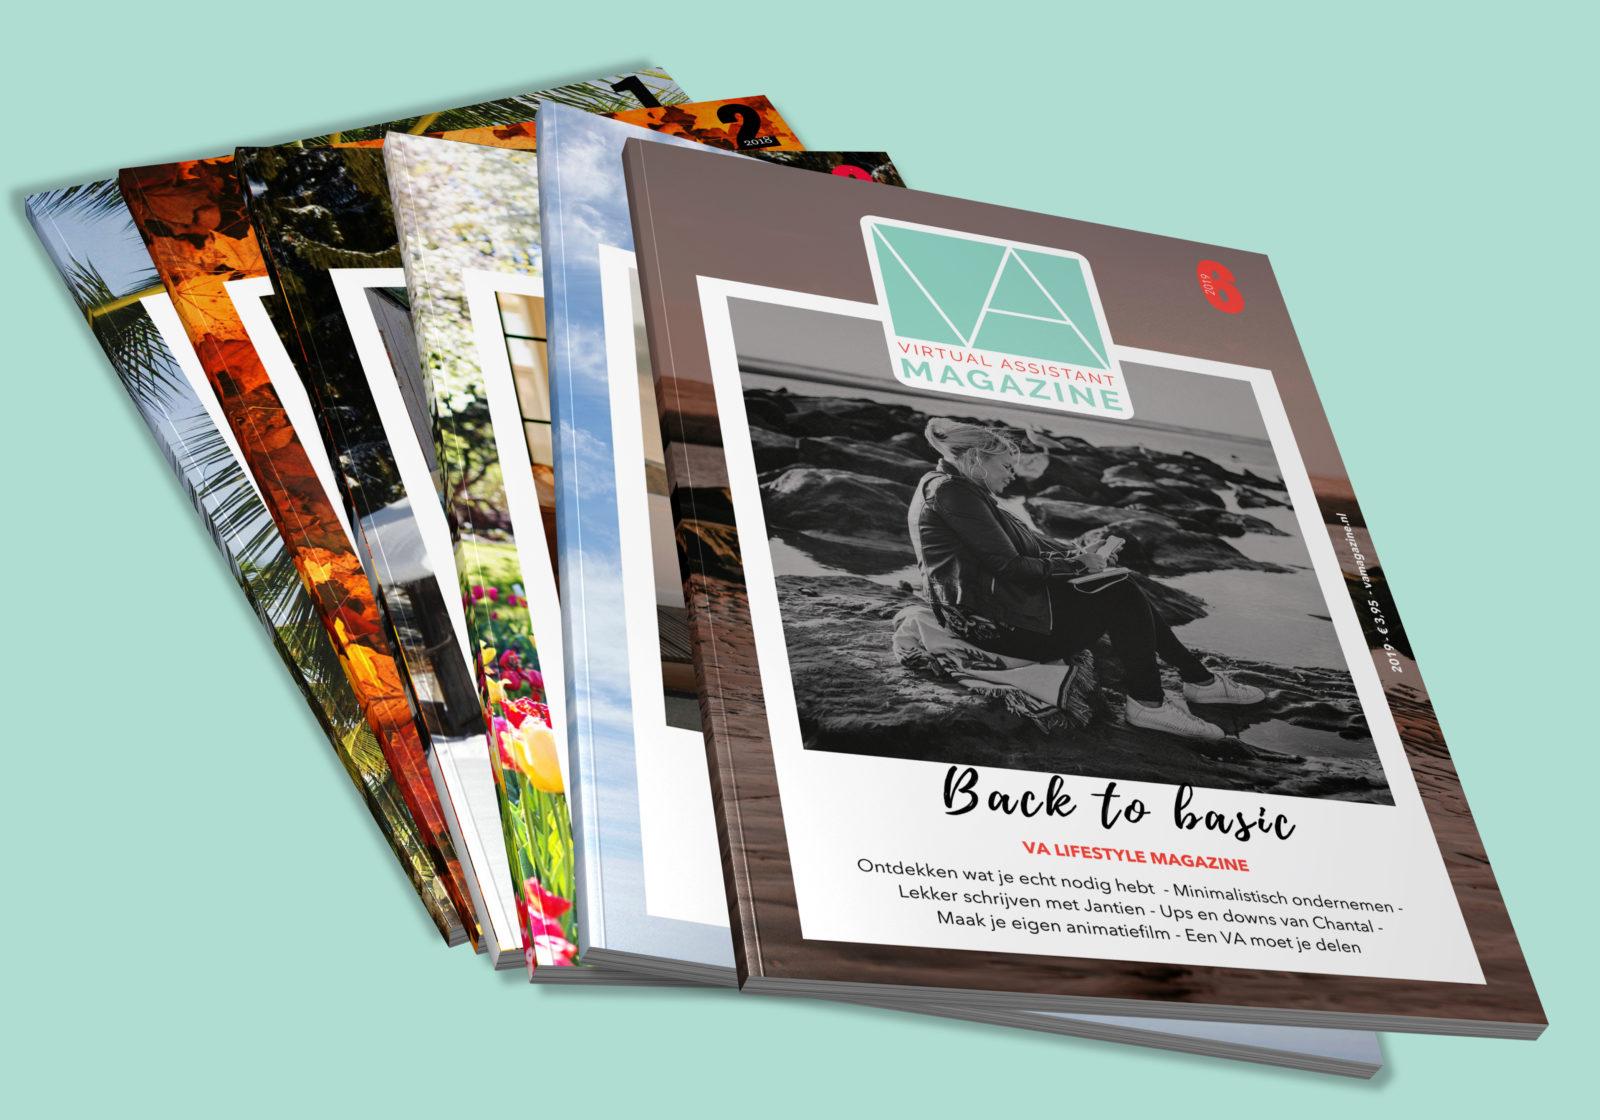 Virtual assistant magazine